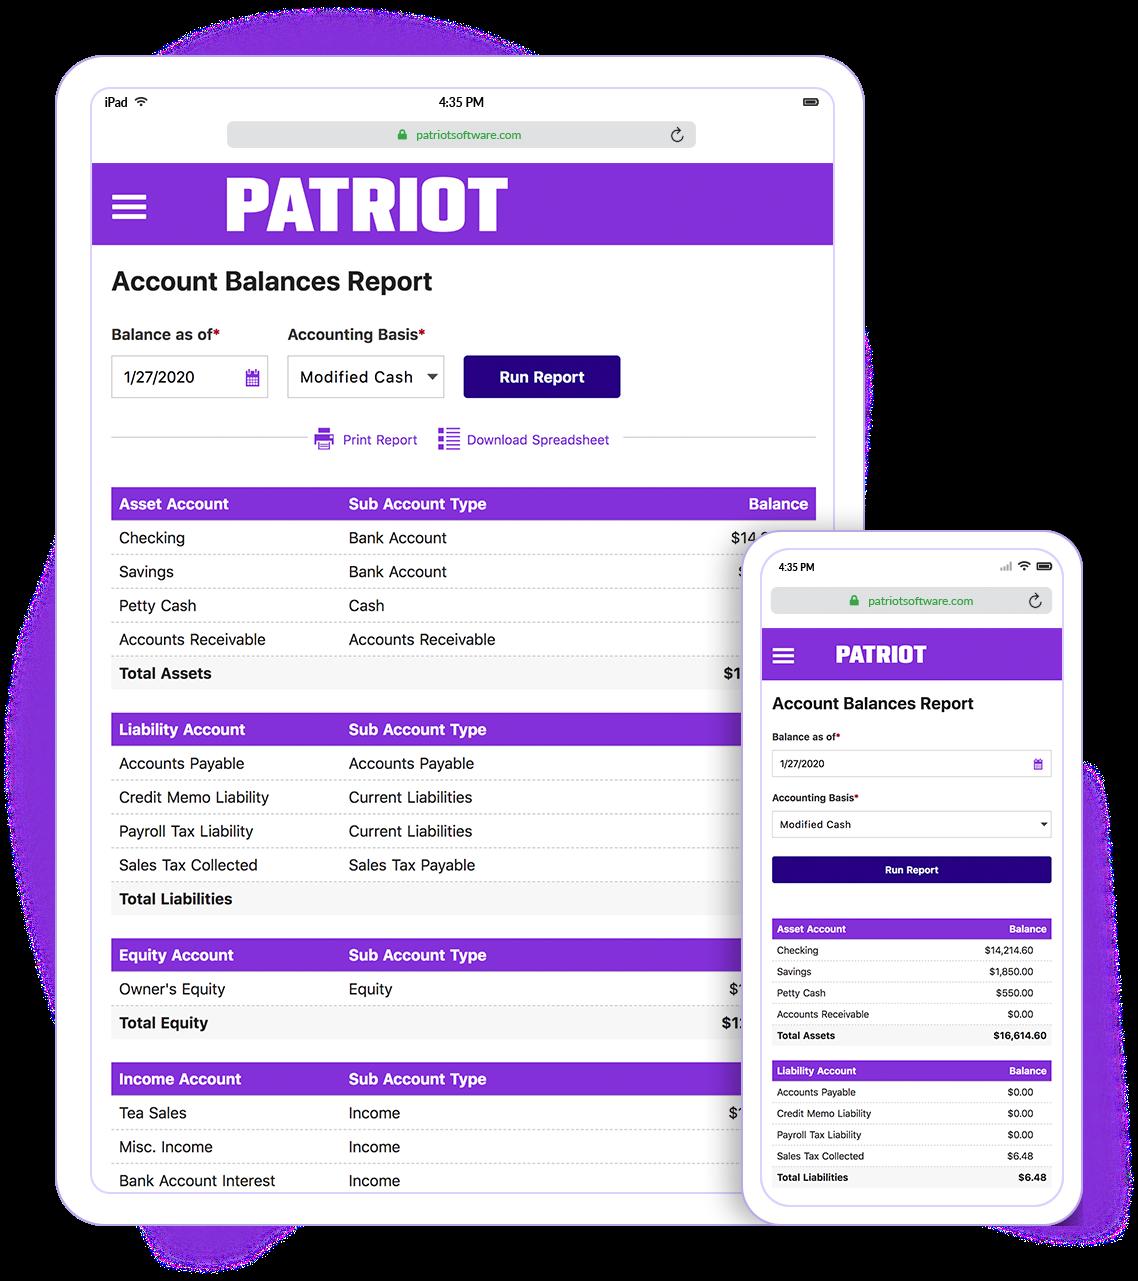 Patriot Accounting Software - Account Balances Report